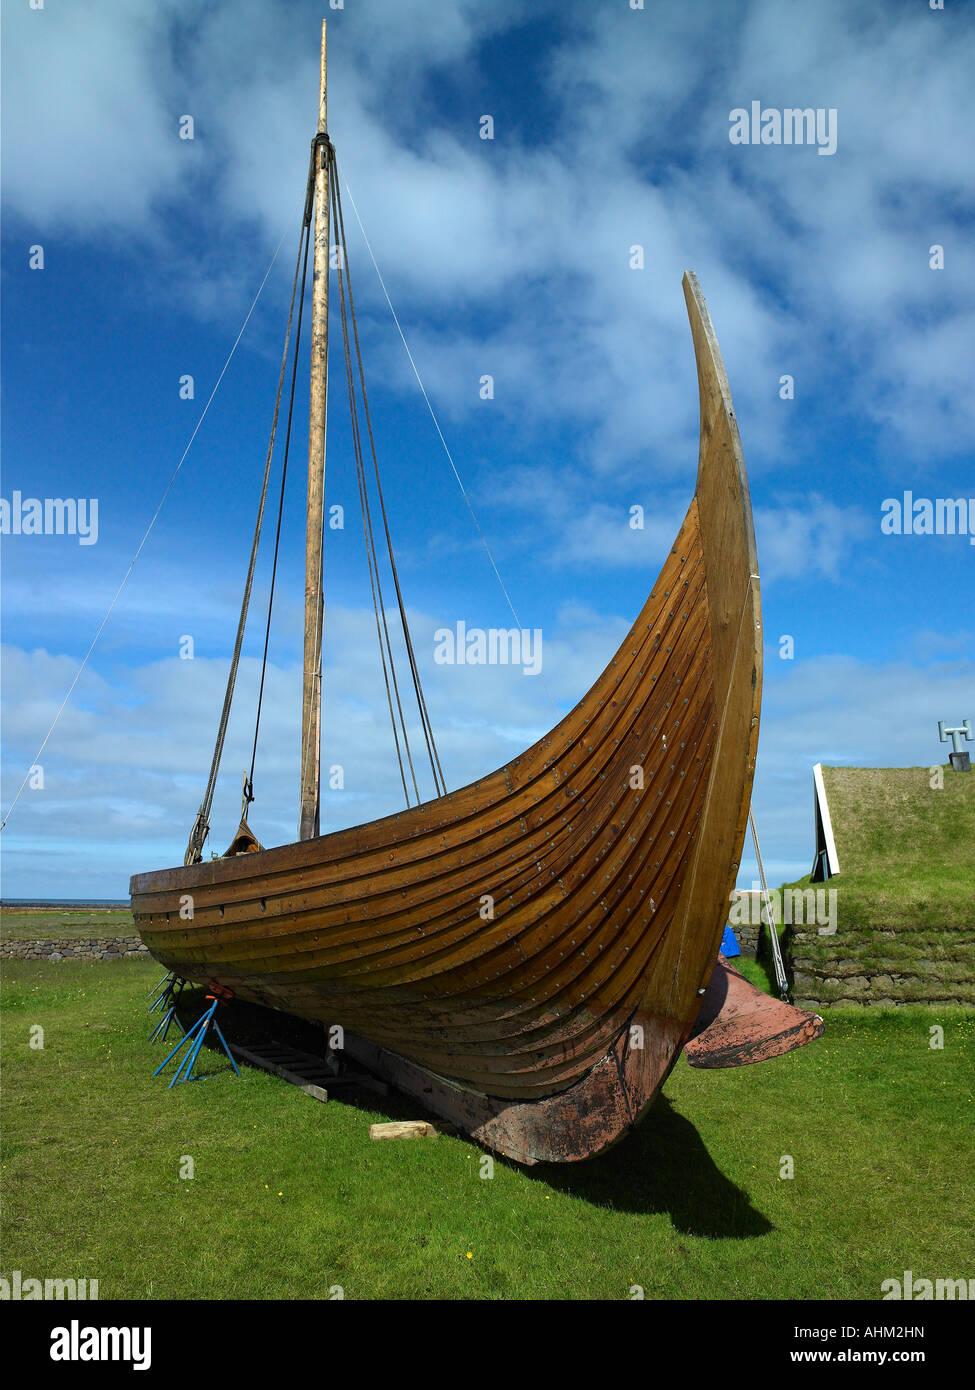 The Replica Viking Ship Islendingur, Iceland - Stock Image